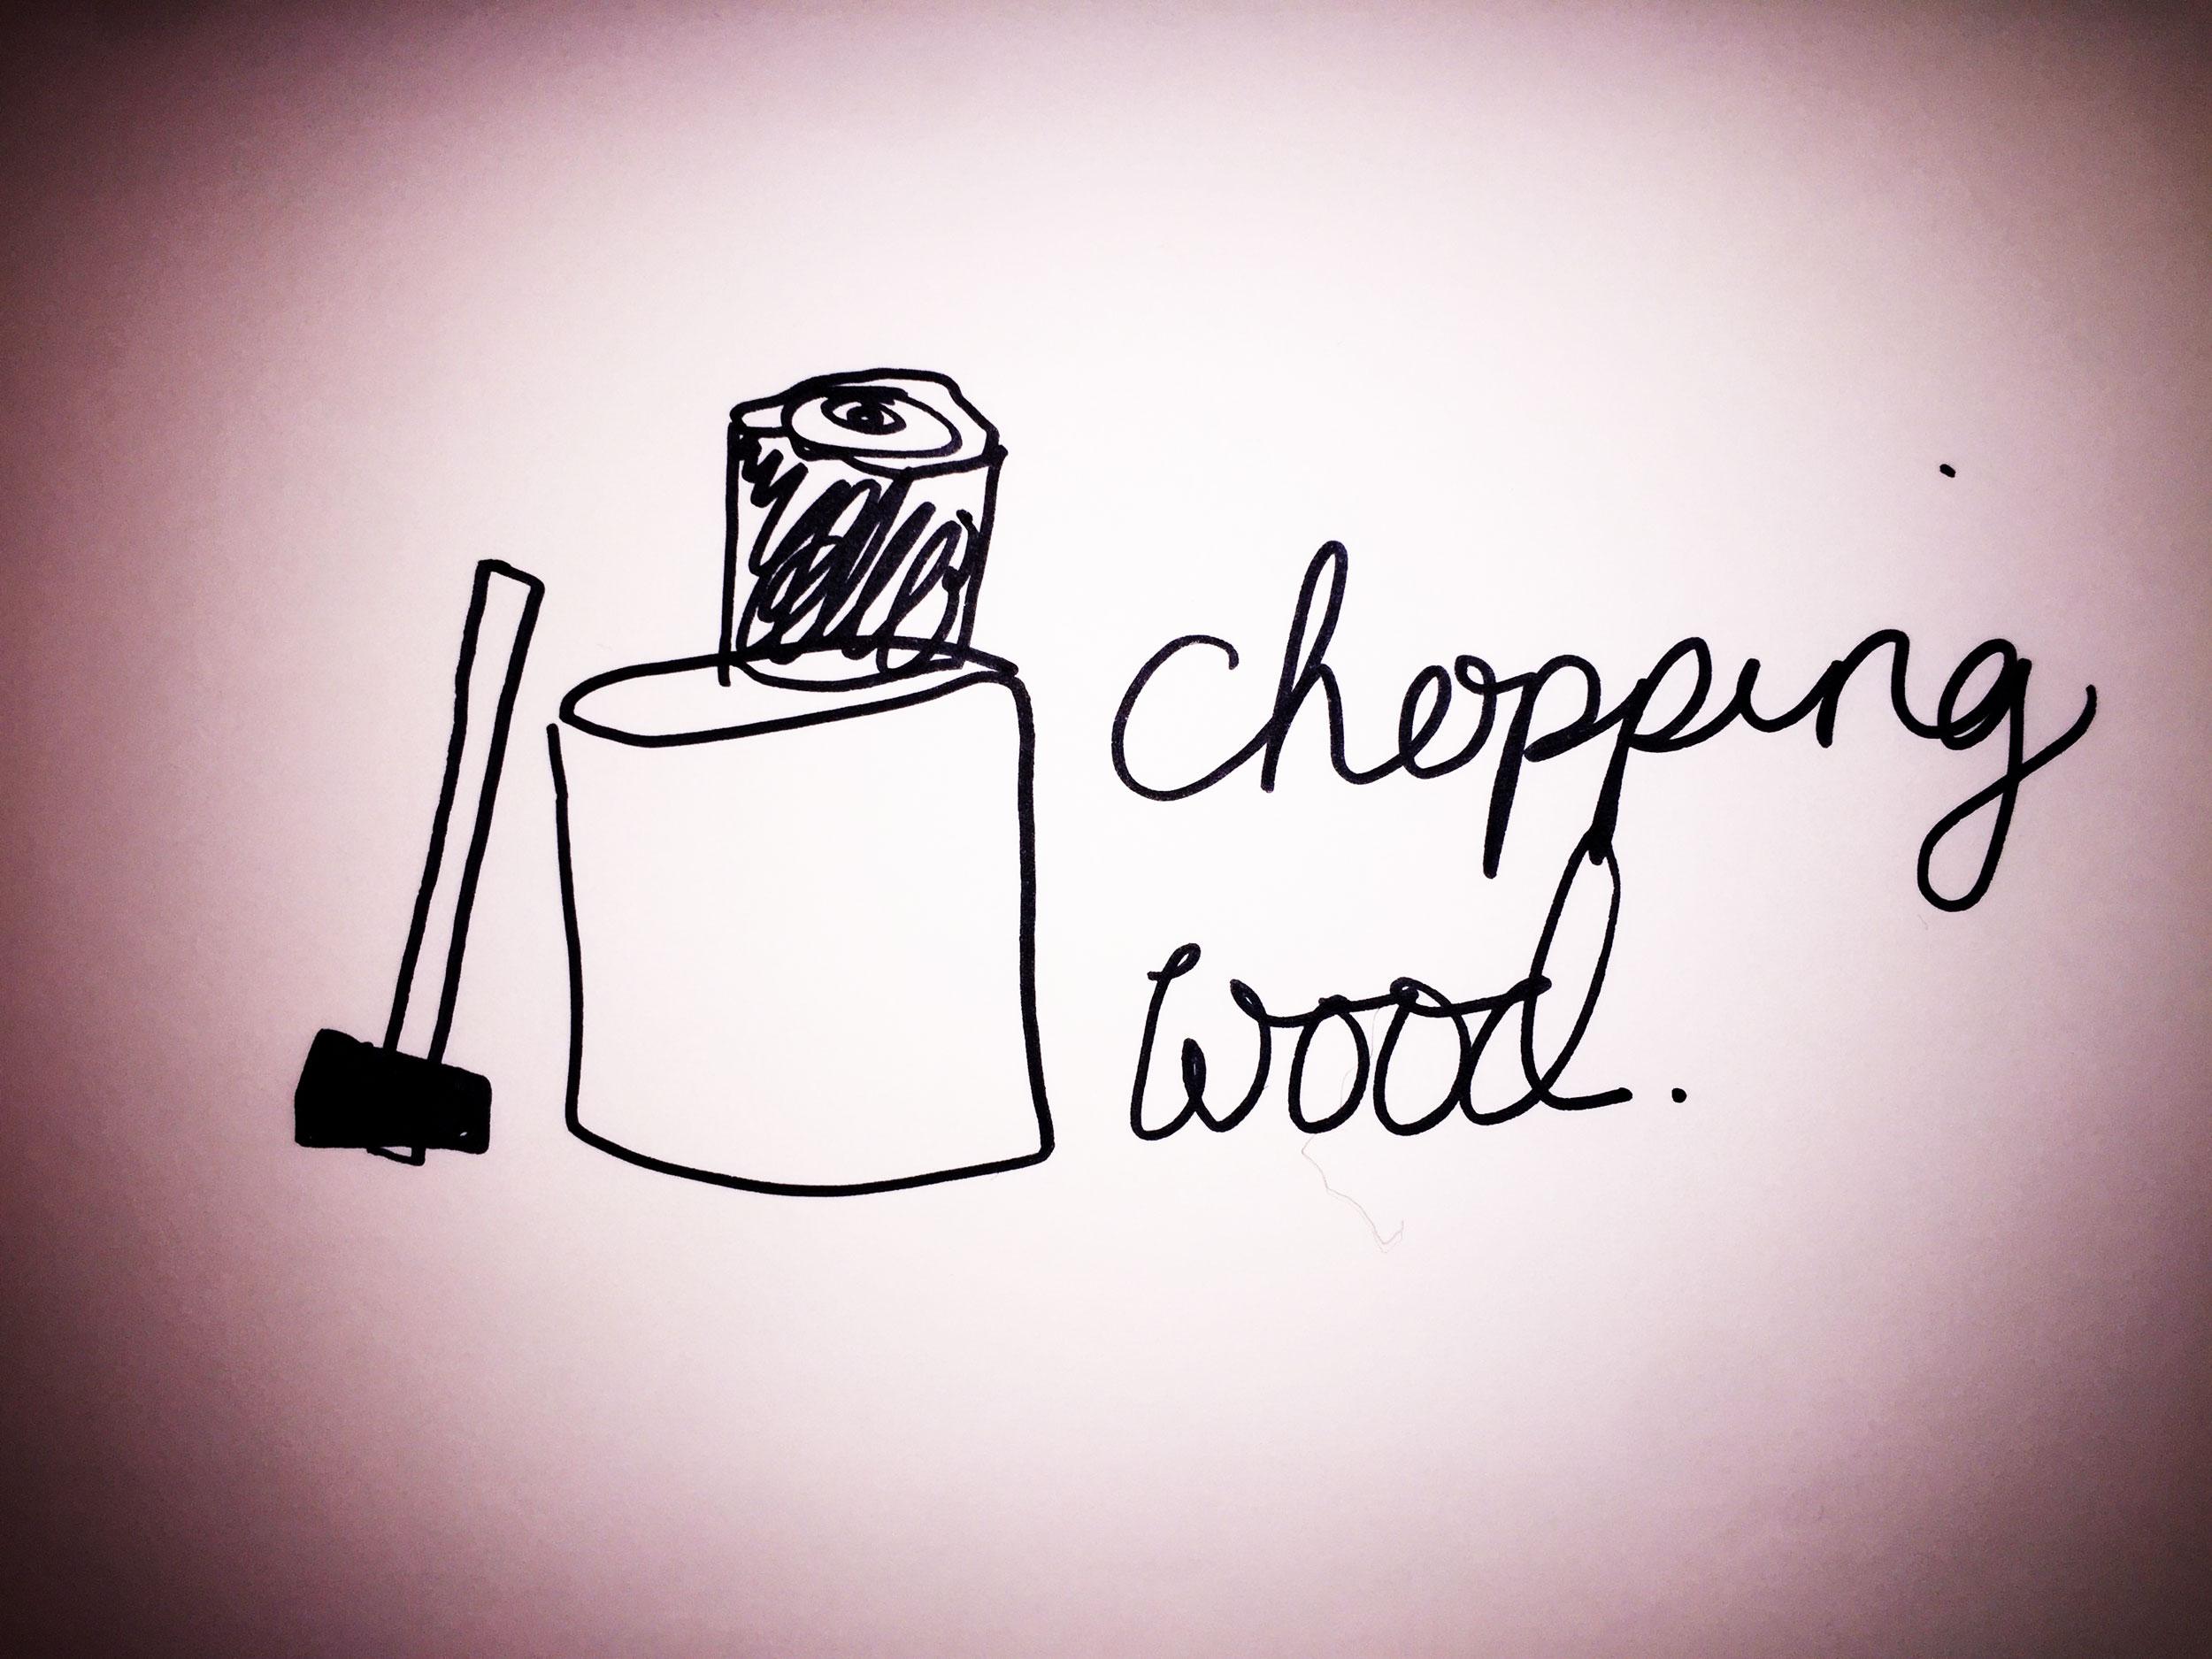 Chopping wood. Drawing Luke Hockley.